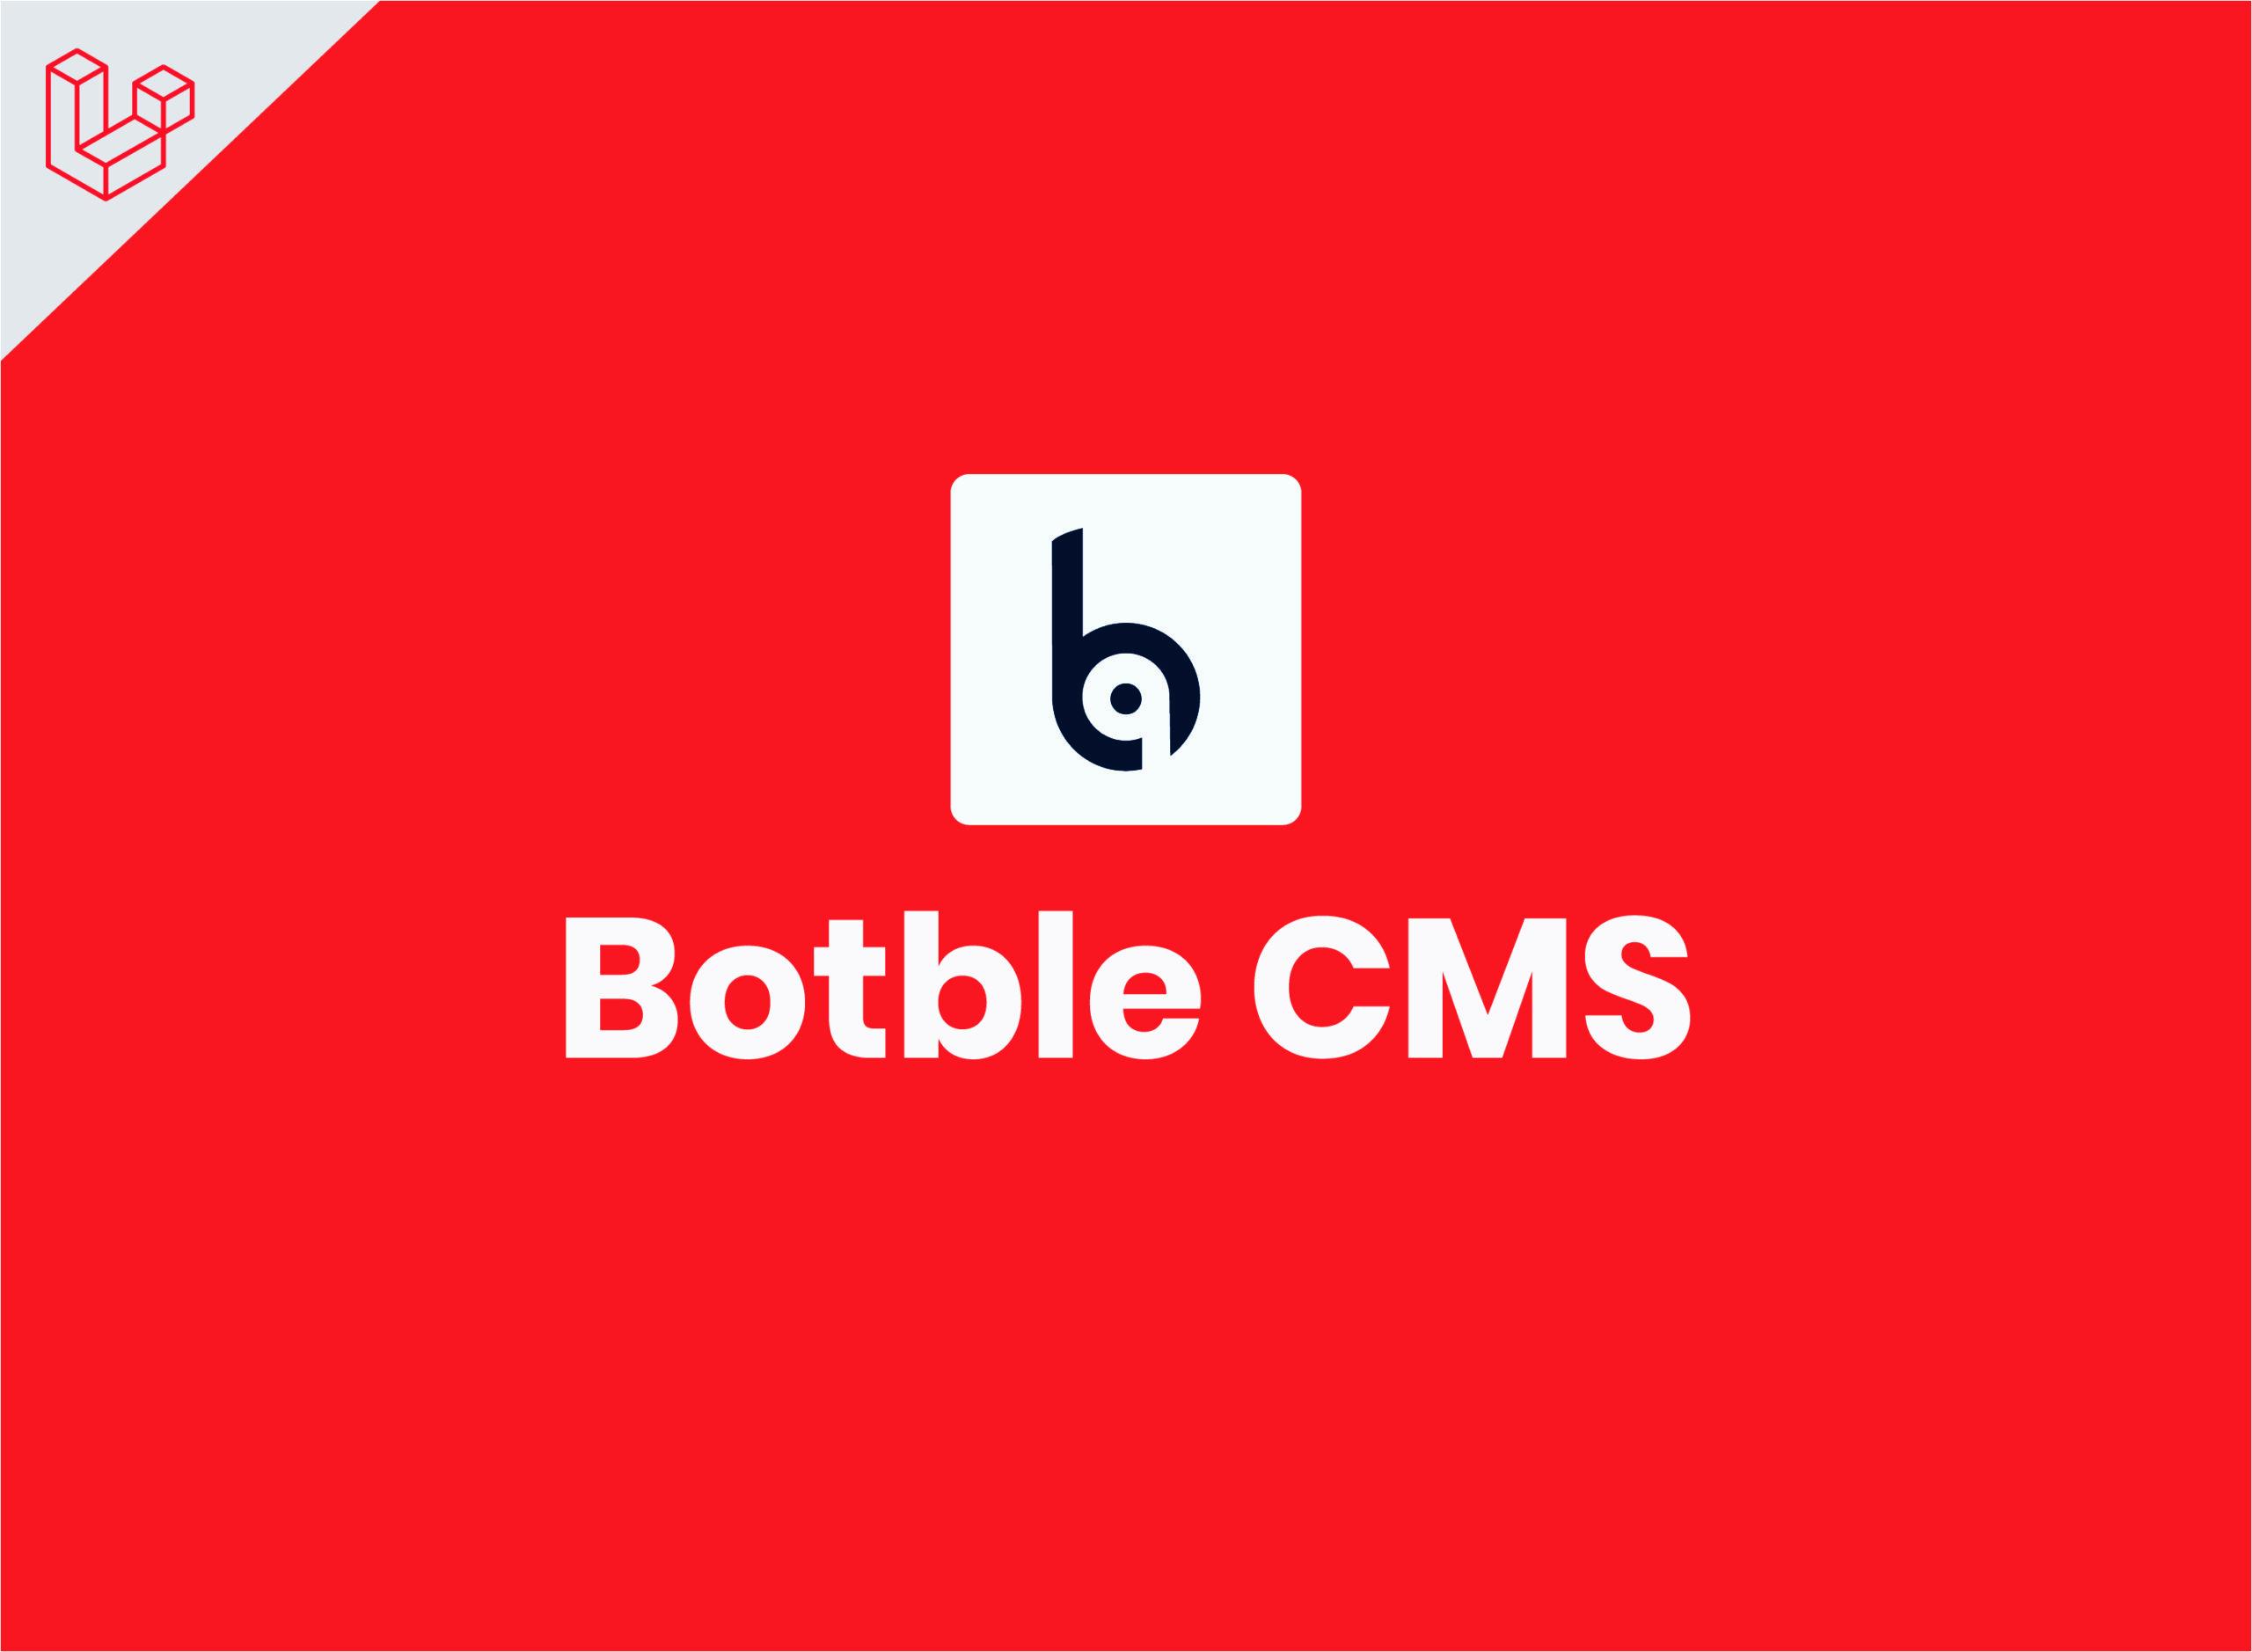 Botble CMS